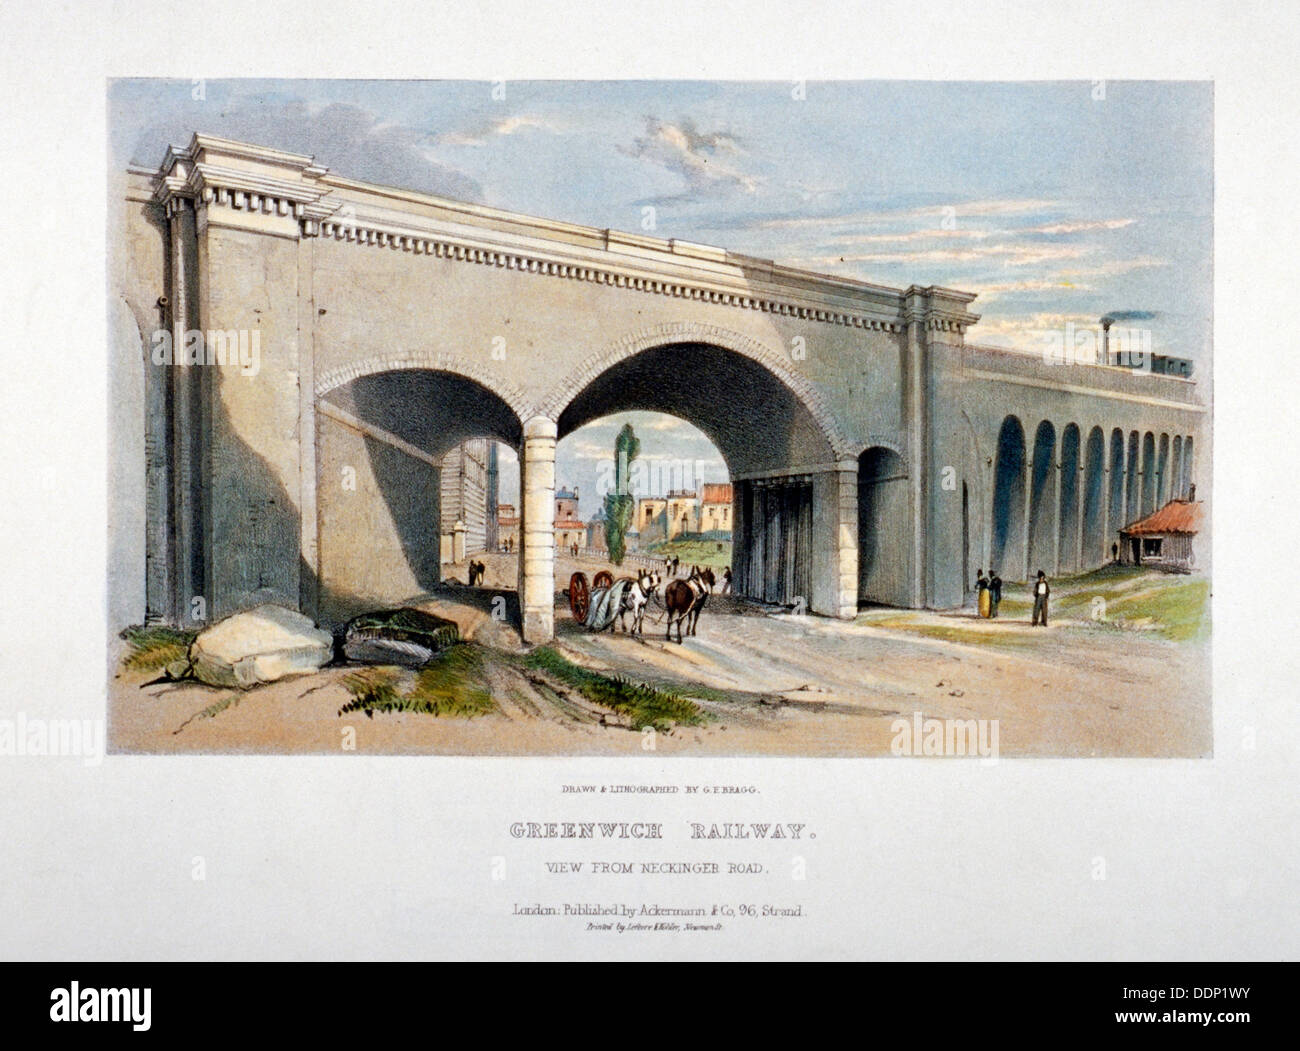 London and Greenwich Railway bridge over the Neckinger Road, Bermondsey, London, 1836.     Artist: GF Bragg Stock Photo